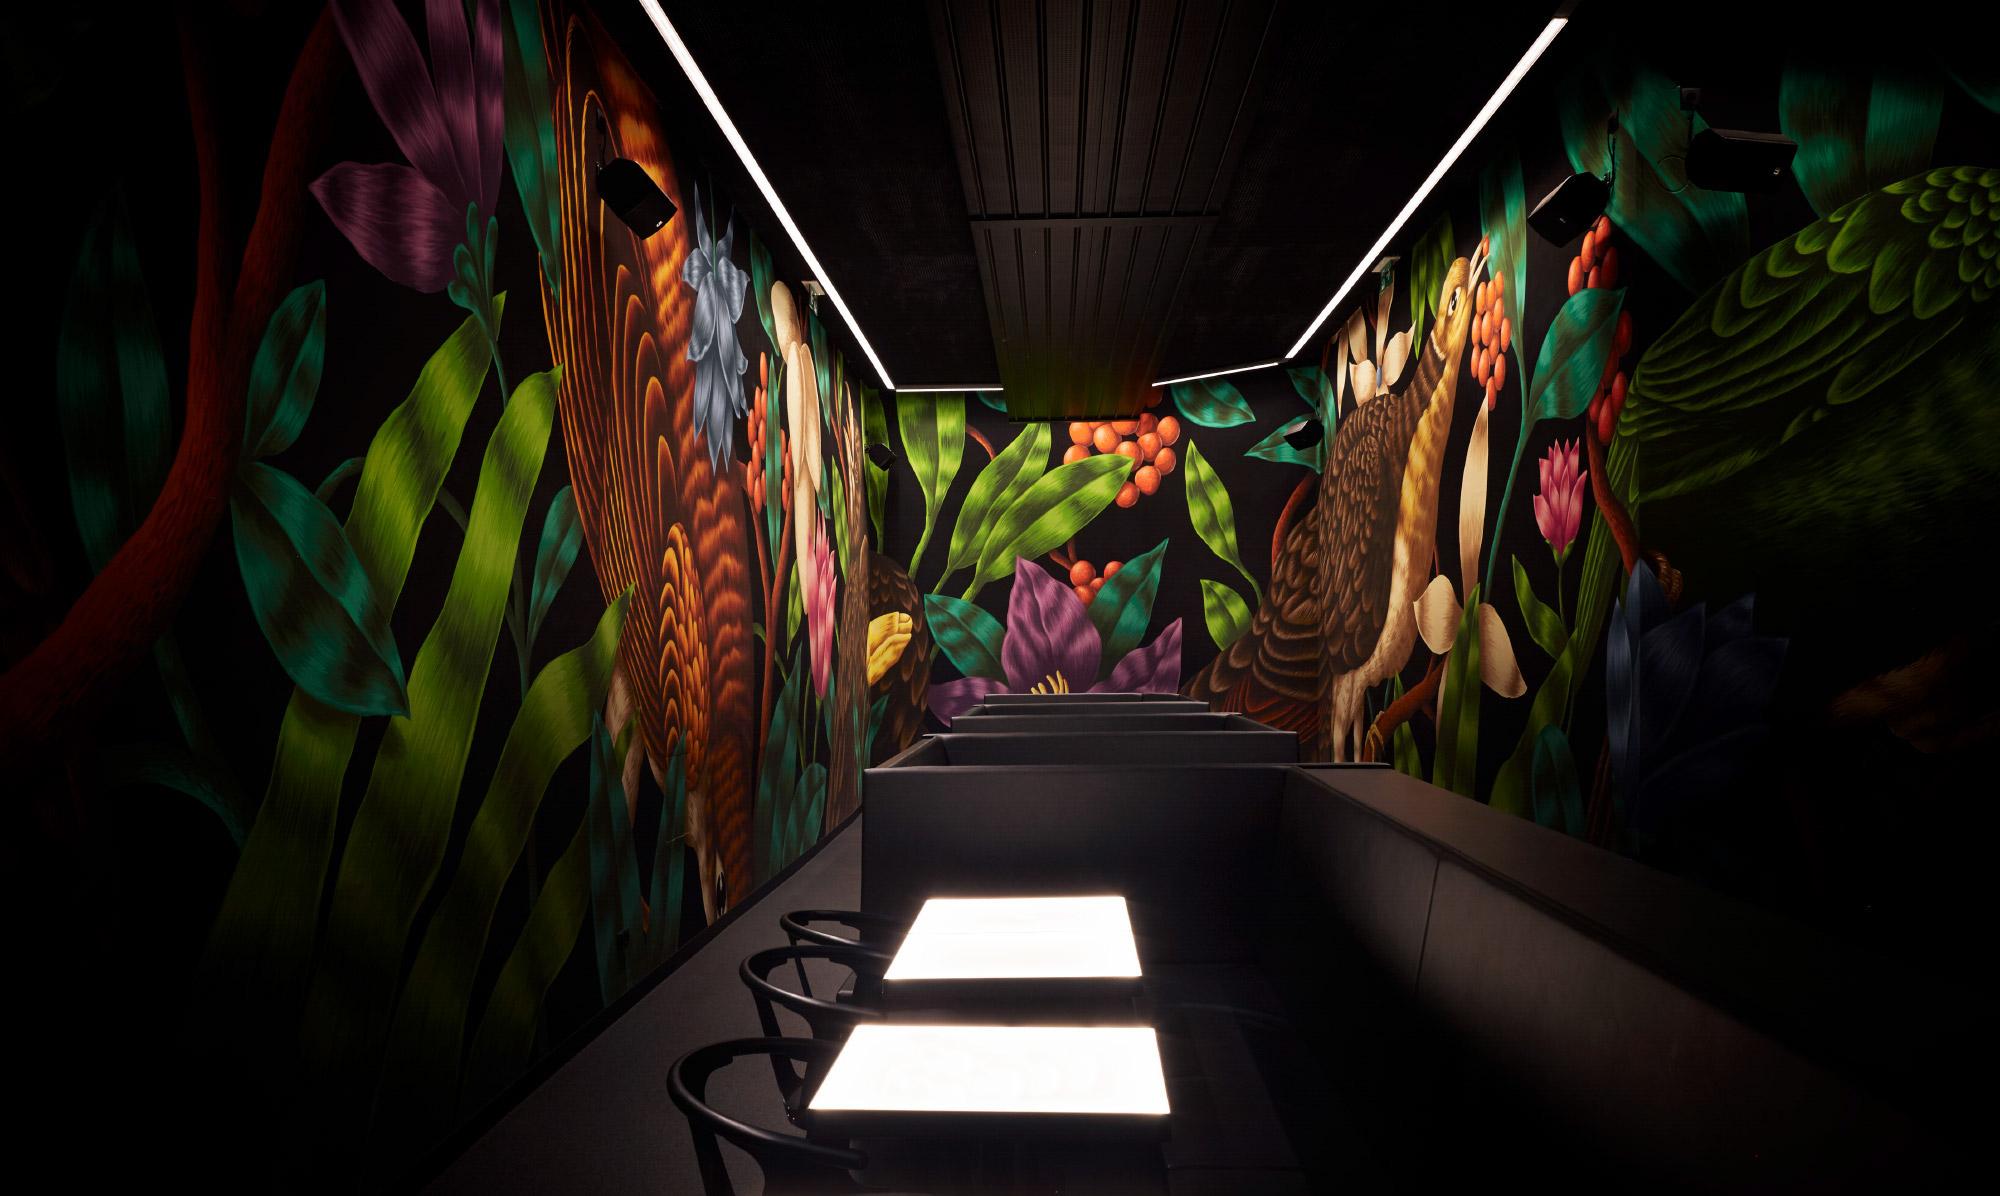 the-birdyard-atelier-olschinsky-goodfromyou-15.jpg